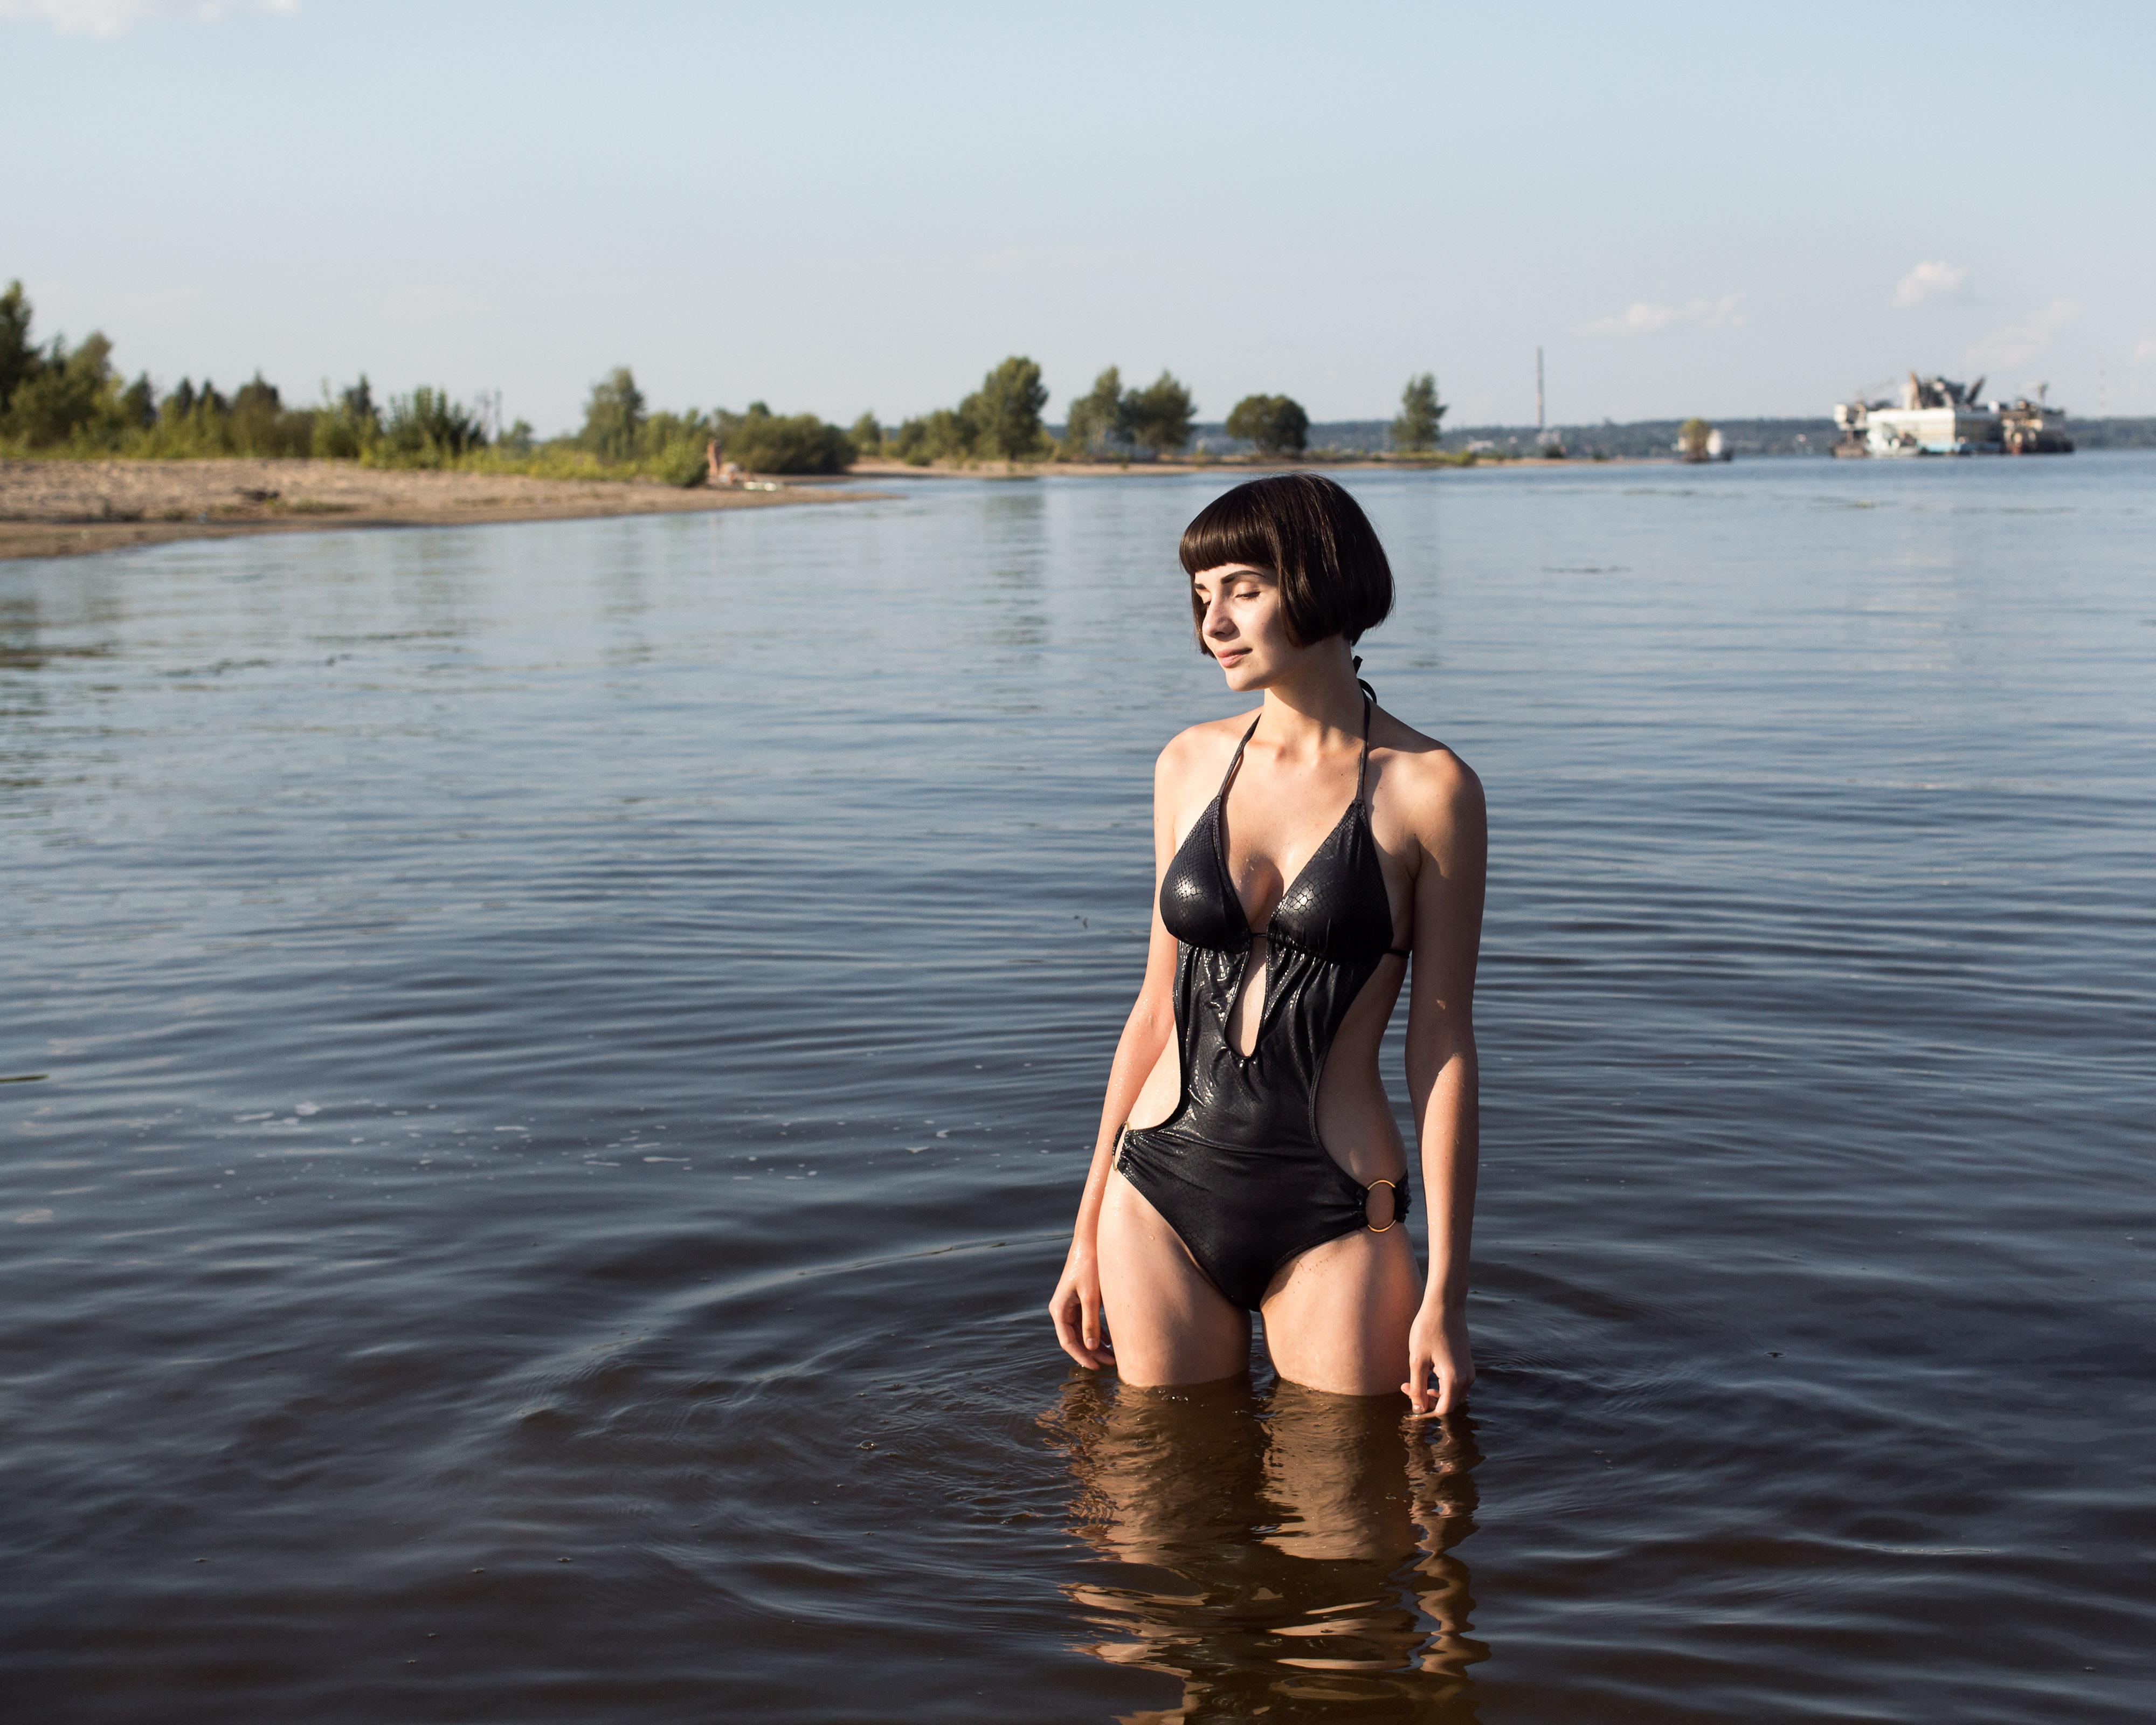 Russian Summer